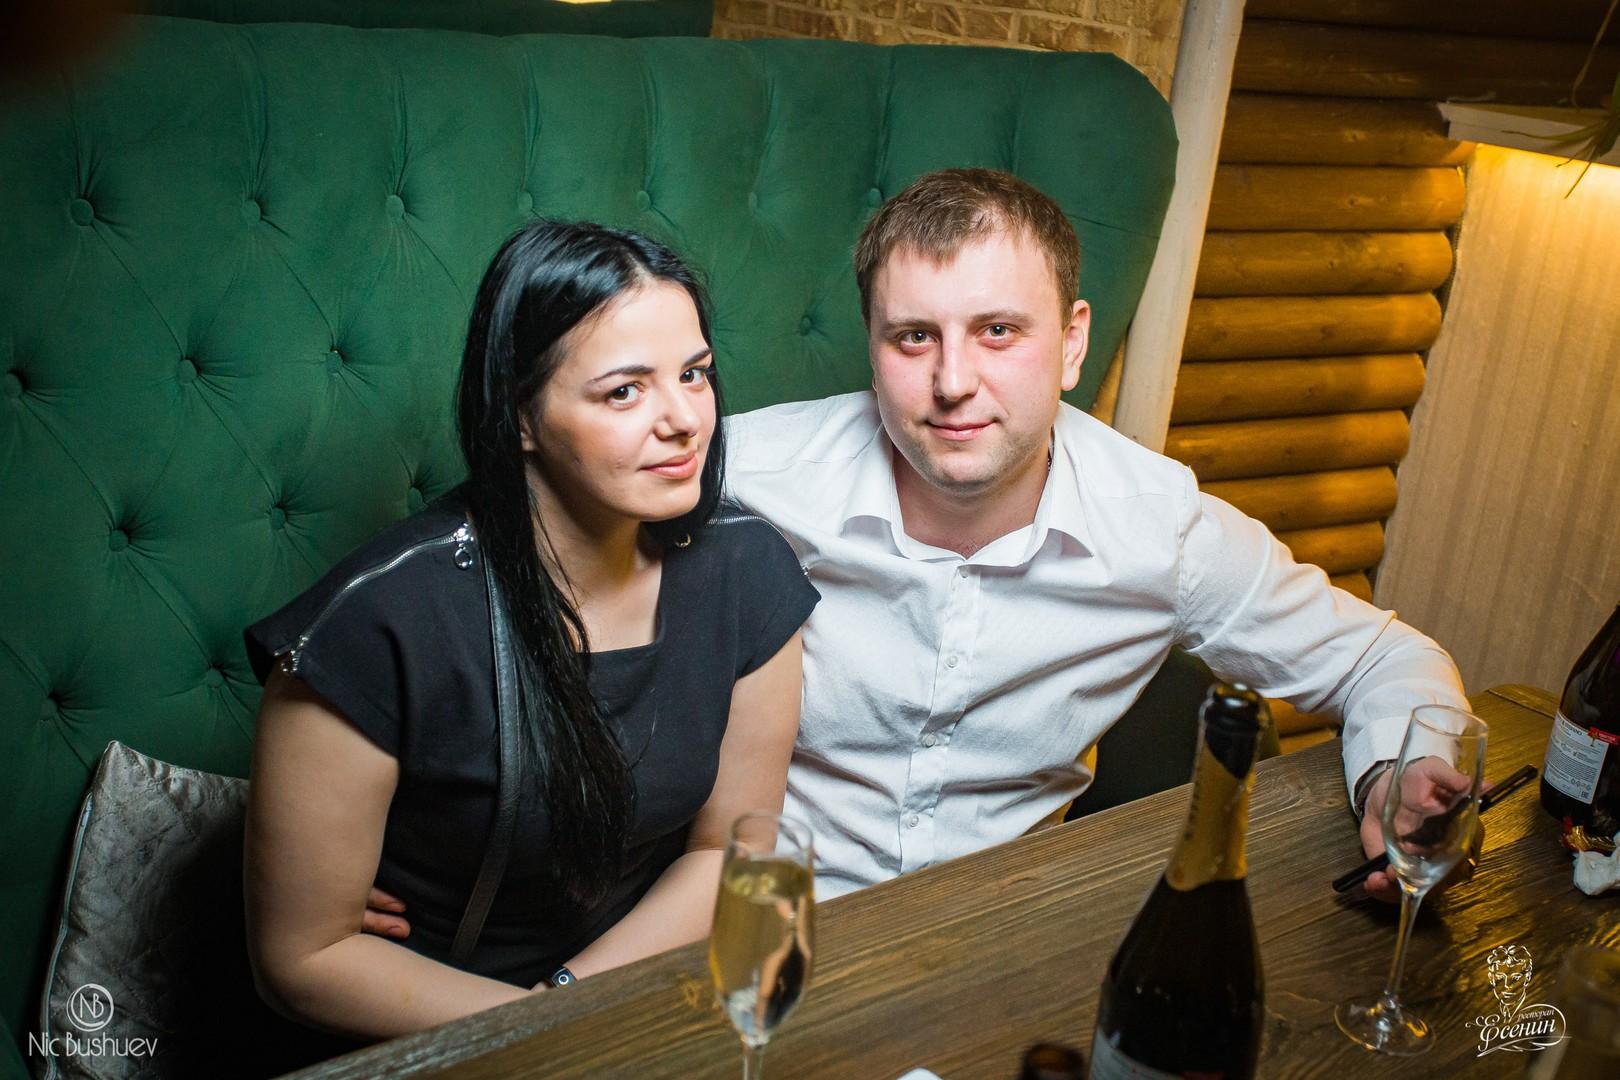 Ресторан Орехово-Зуево Есенин 14_02_2020 (20)